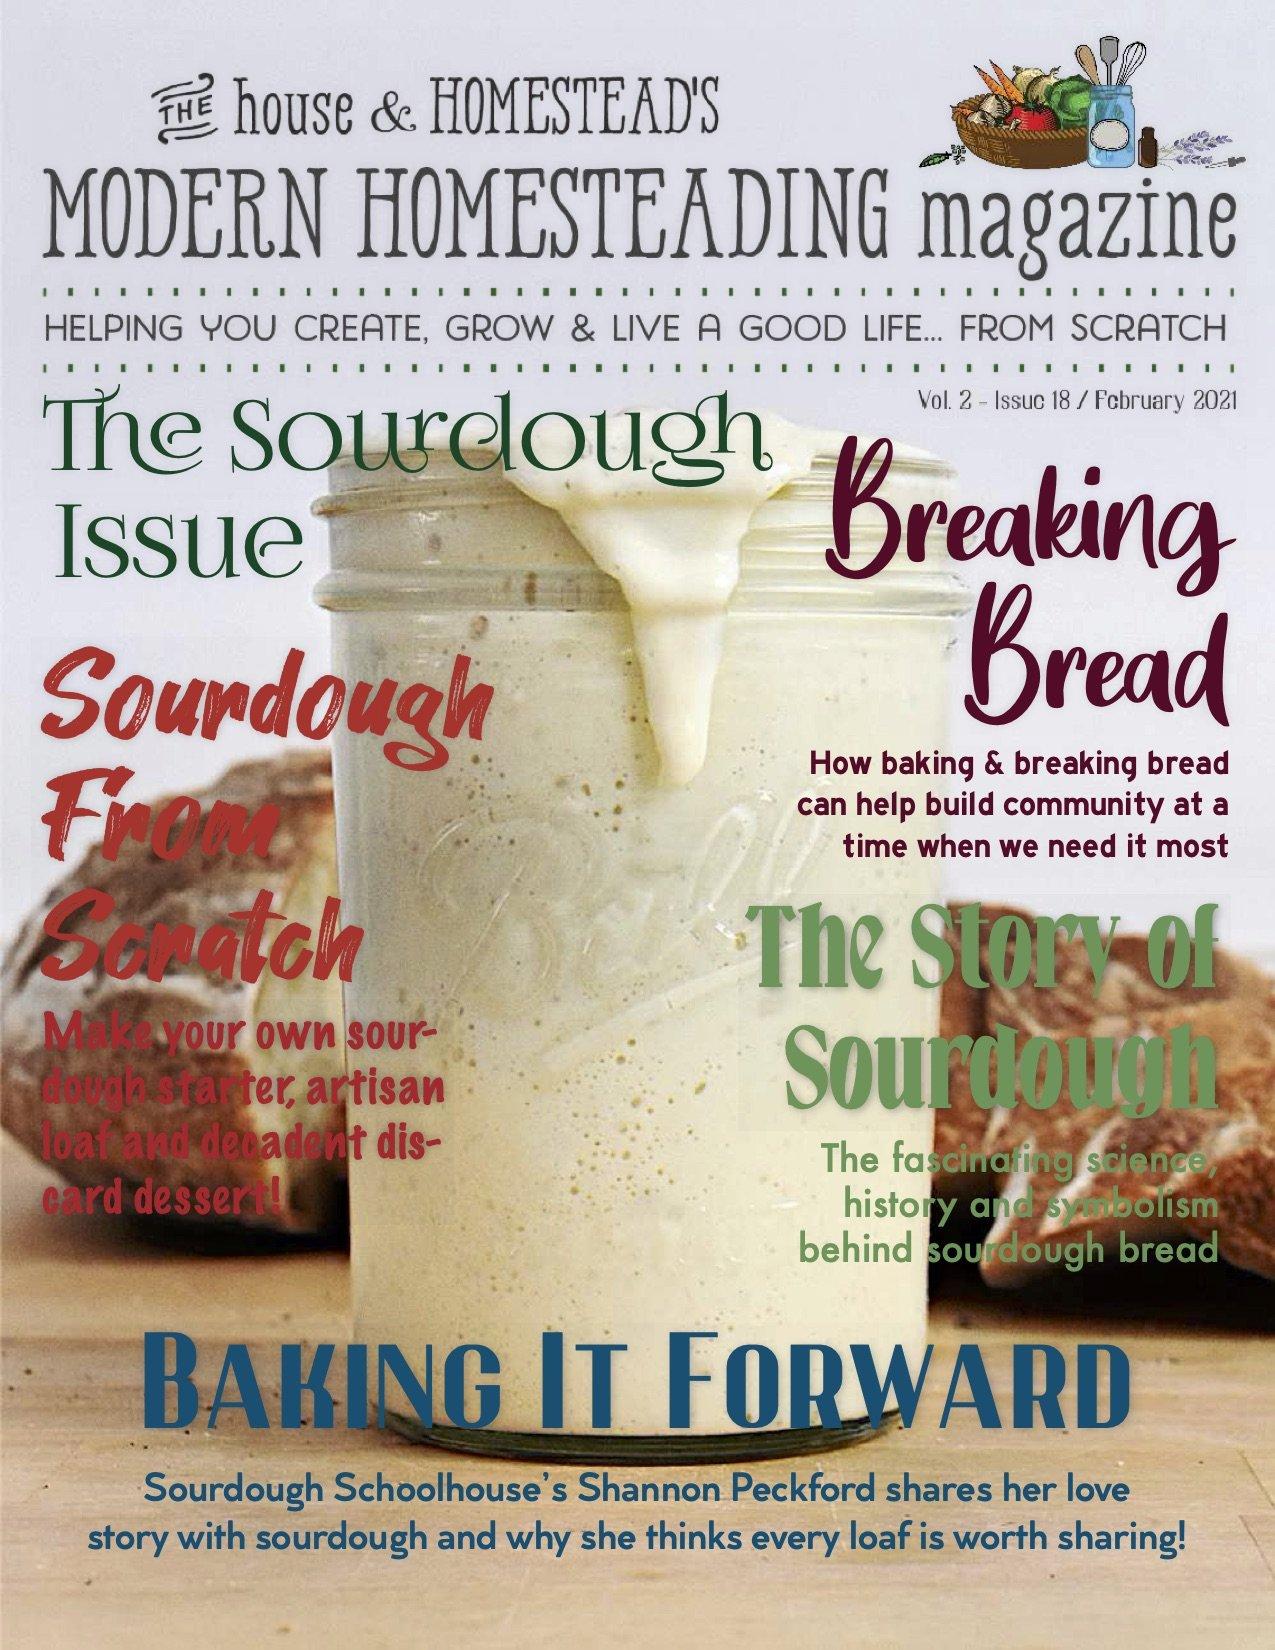 Modern Homesteading Magazine | The Sourdough Issue | February 2021